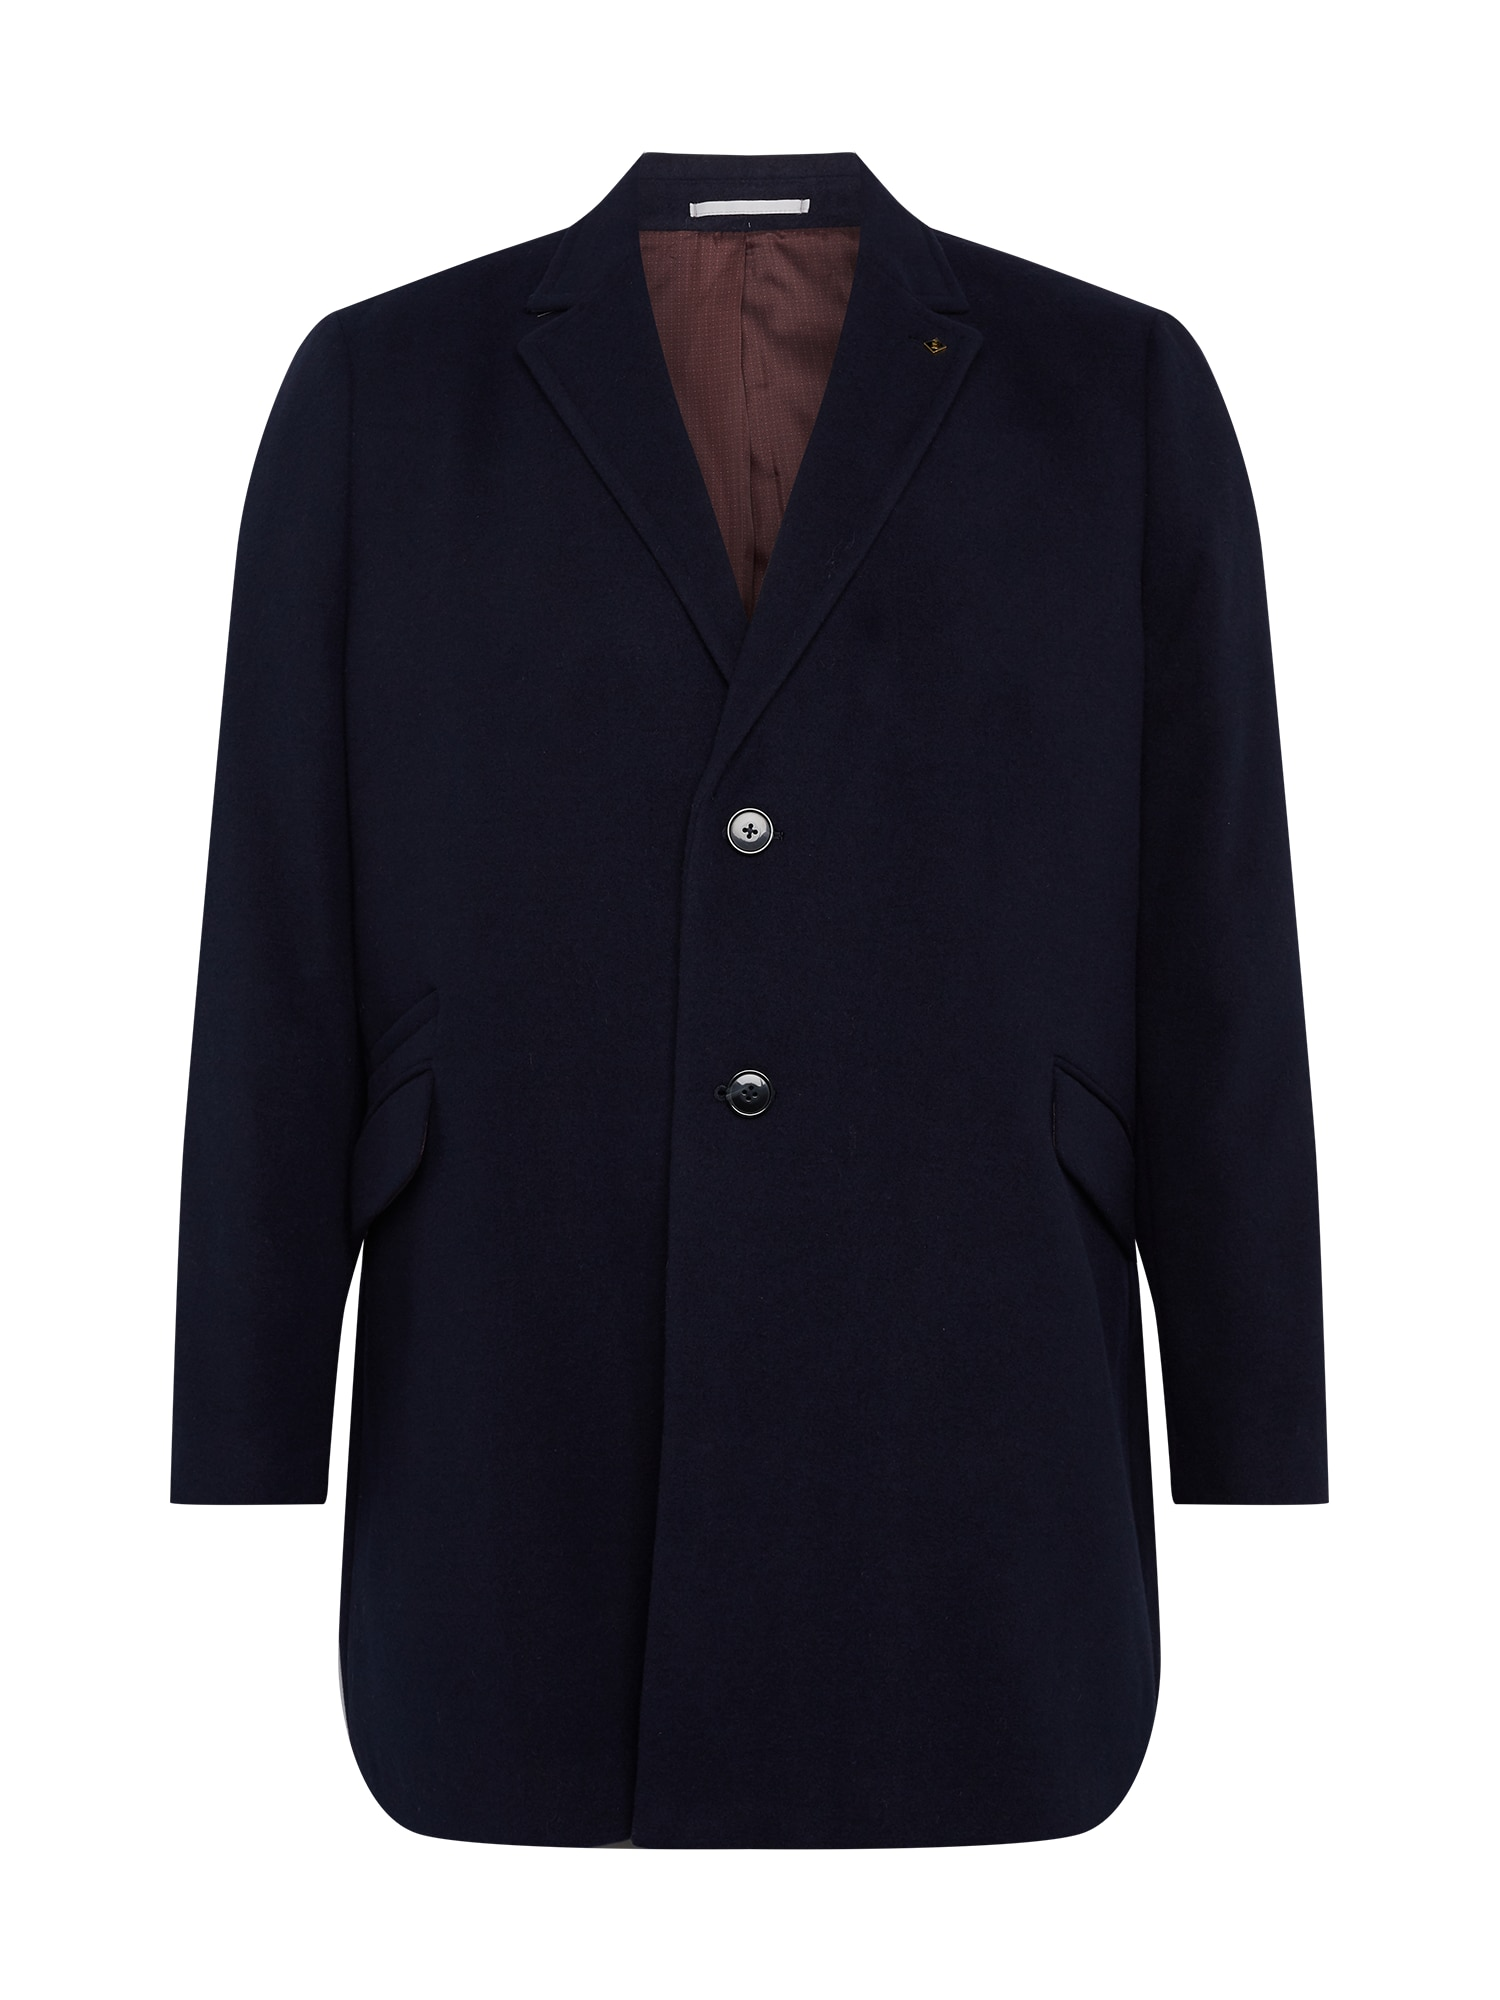 BURTON MENSWEAR LONDON (Big & Tall) Demisezoninis paltas tamsiai mėlyna